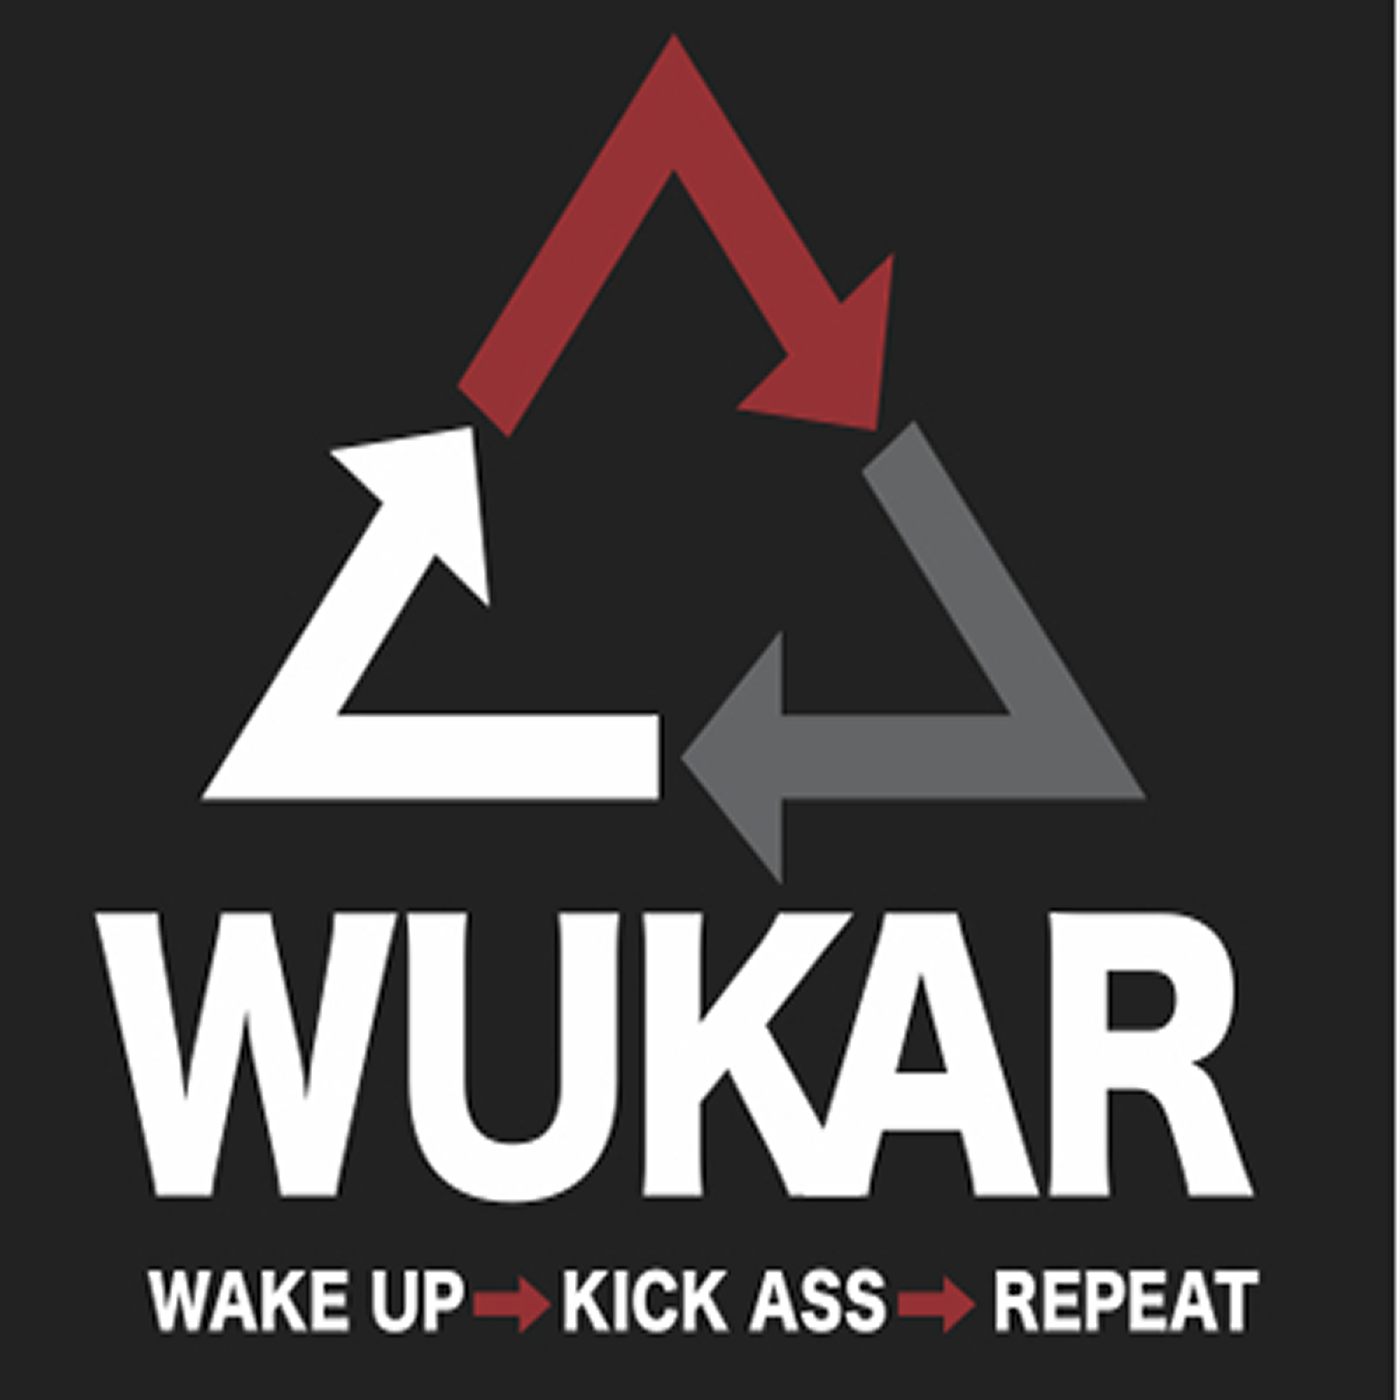 The WUKAST